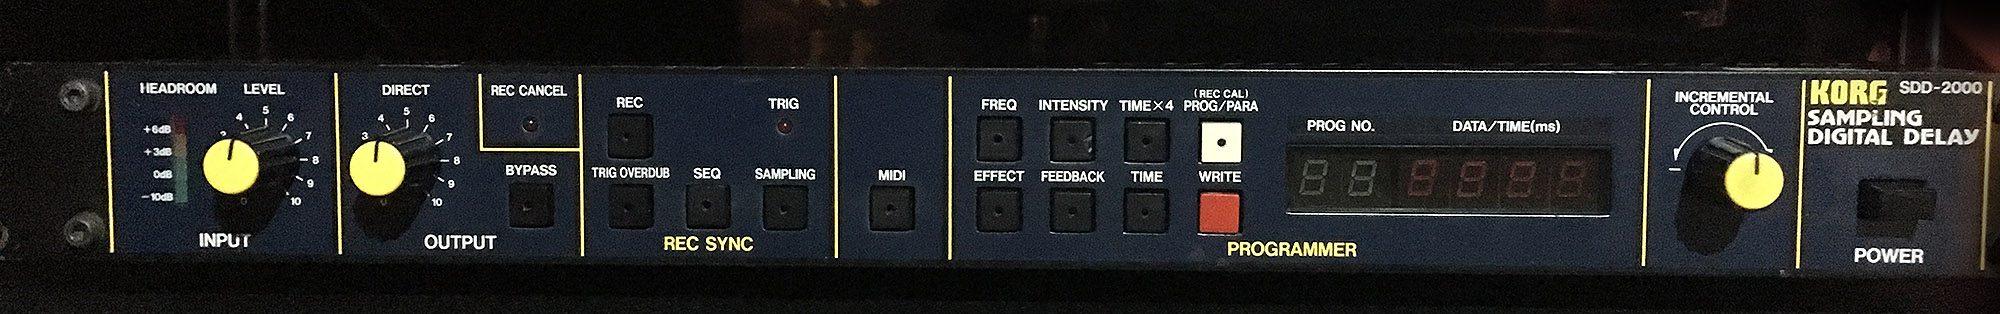 SSD2000